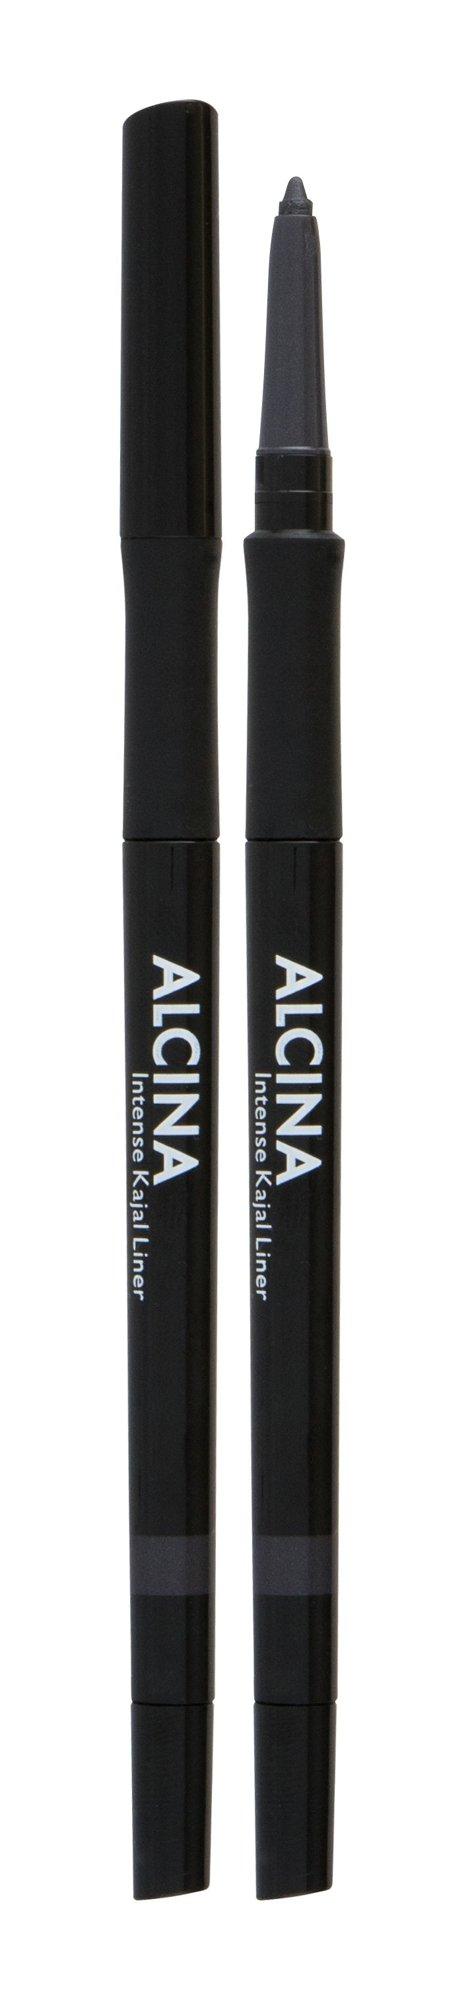 ALCINA Intense Eye Pencil 1ml 030 Grey Kajal Liner